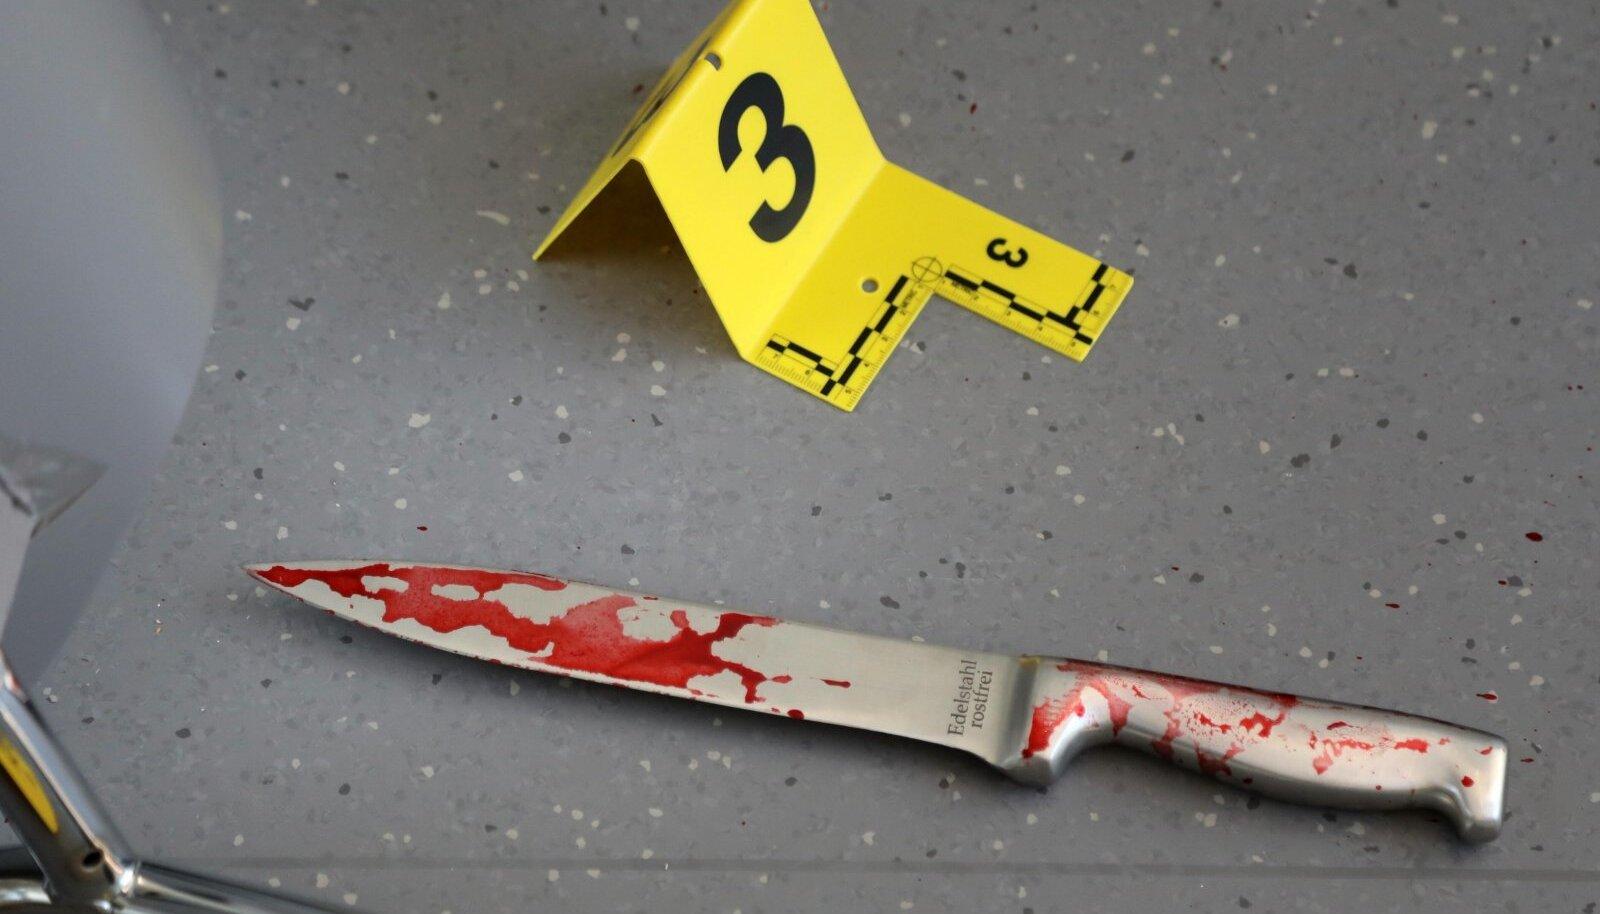 Vorstellung Mordkommission Erfurt 01.07.2020 , Erfurt, Thüringer Landeskriminalamt, Vorstellung der neuen Mordkommission